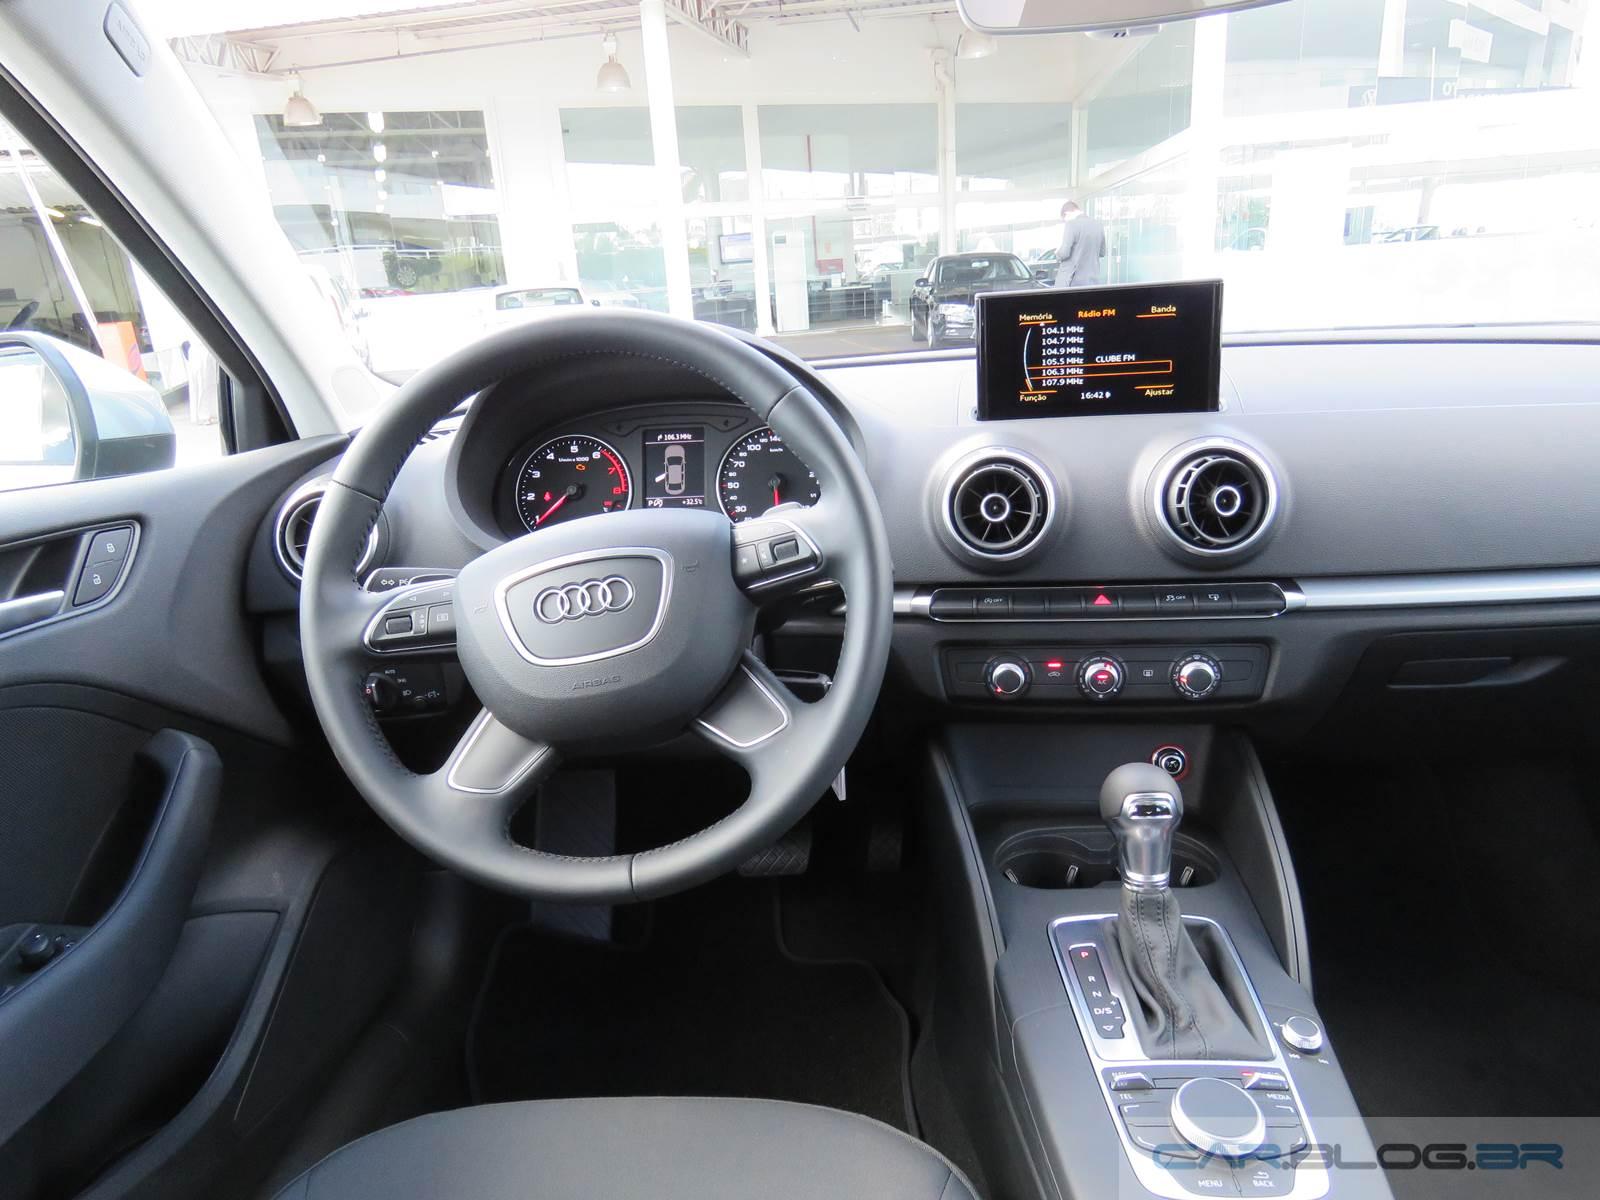 Novo Audi A3 Sedan 1.4 Flex 2016 - interior